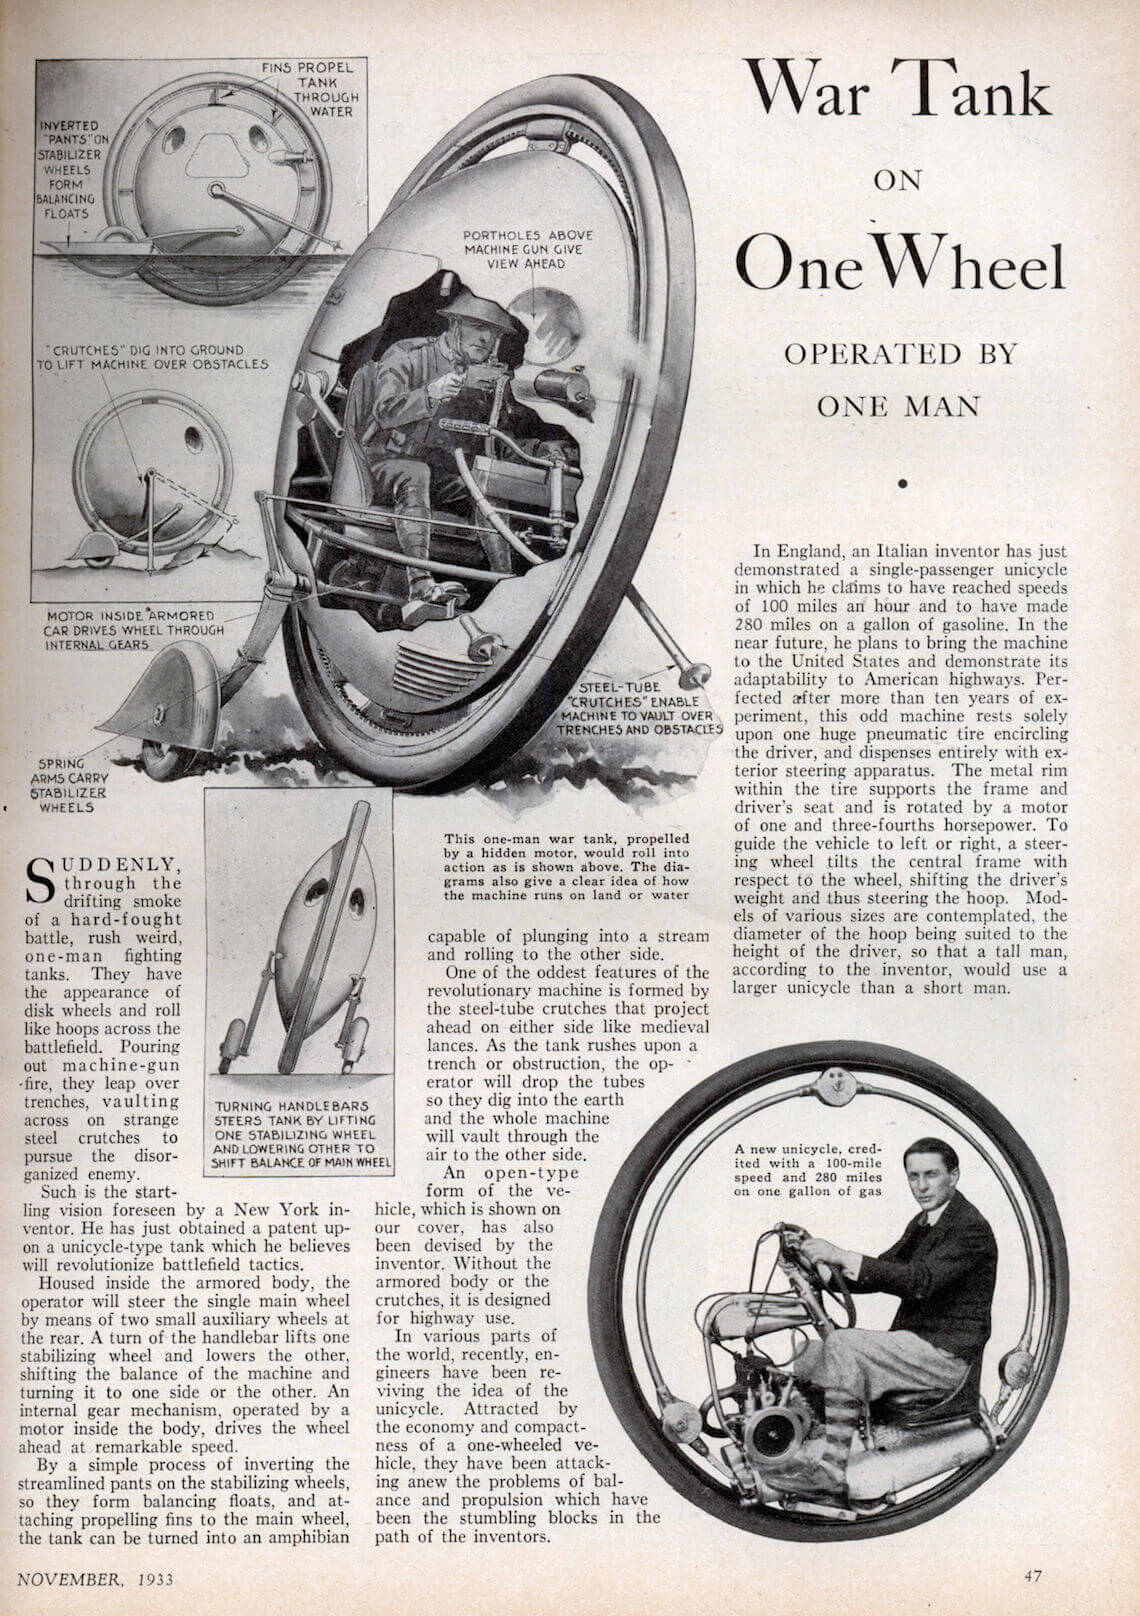 monowheel with guns